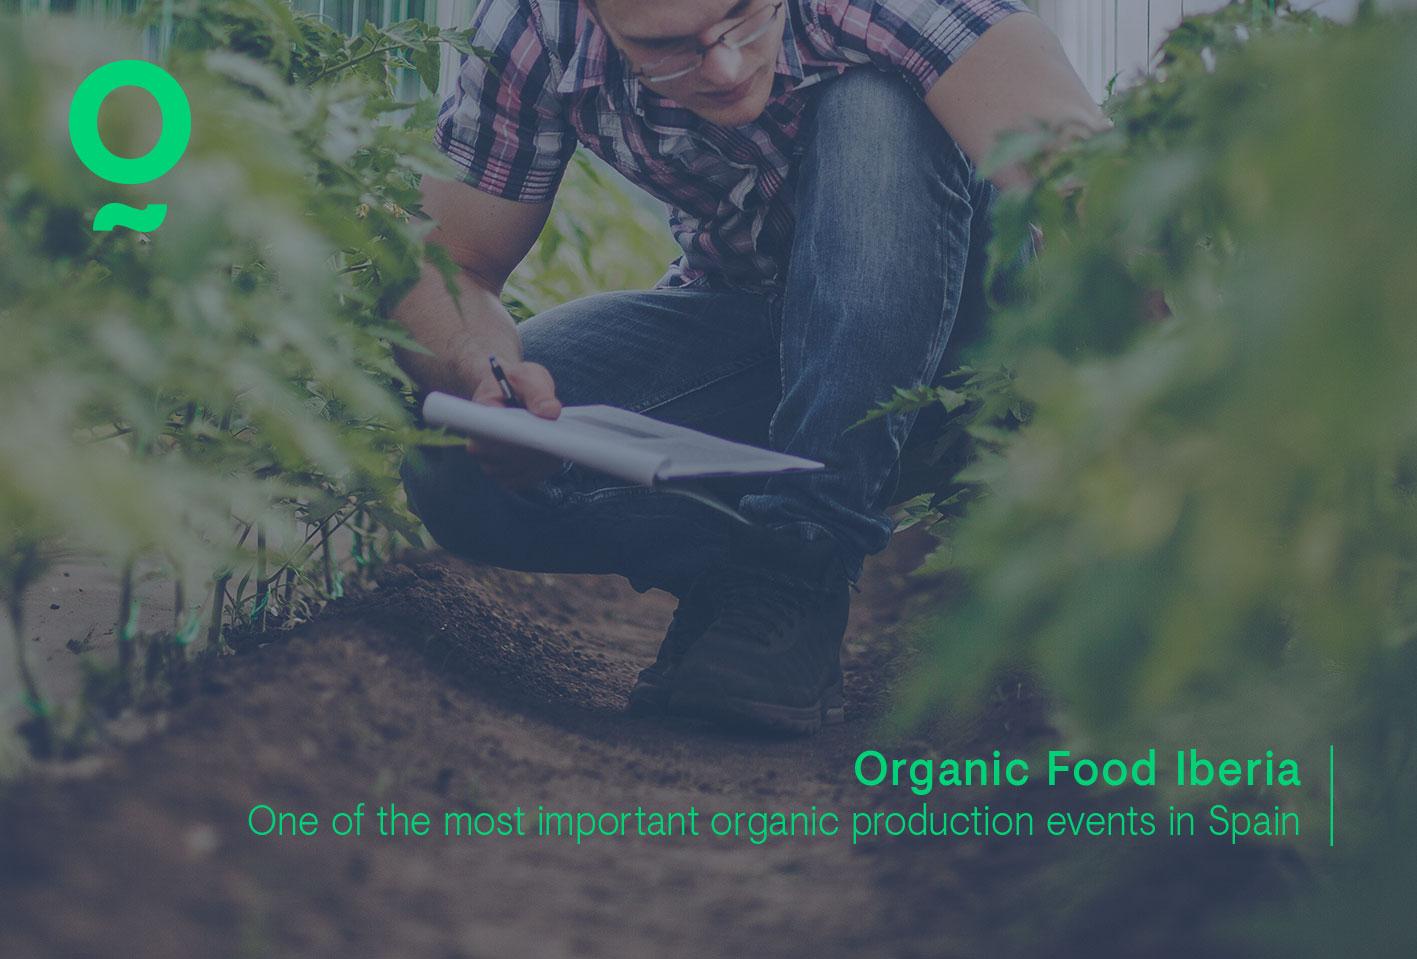 Nafosa estuvo presente en la feria Organic Food Iberia